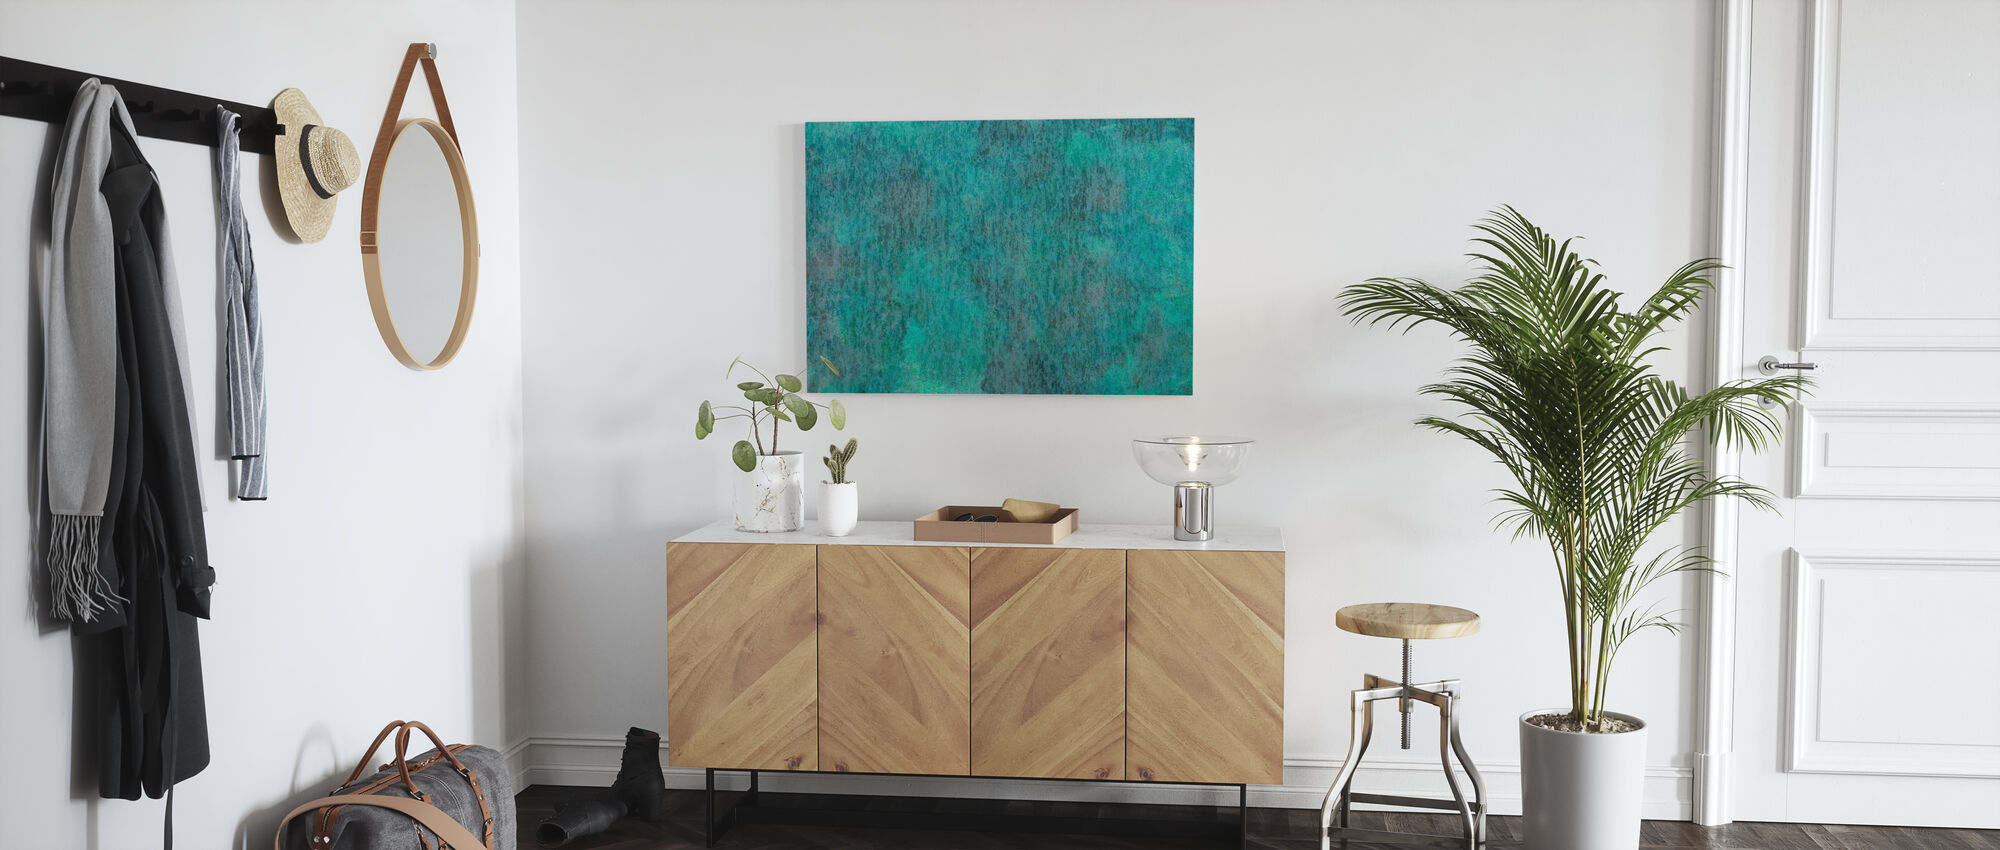 Copper Oxidation on Metal - Canvas print - Hallway